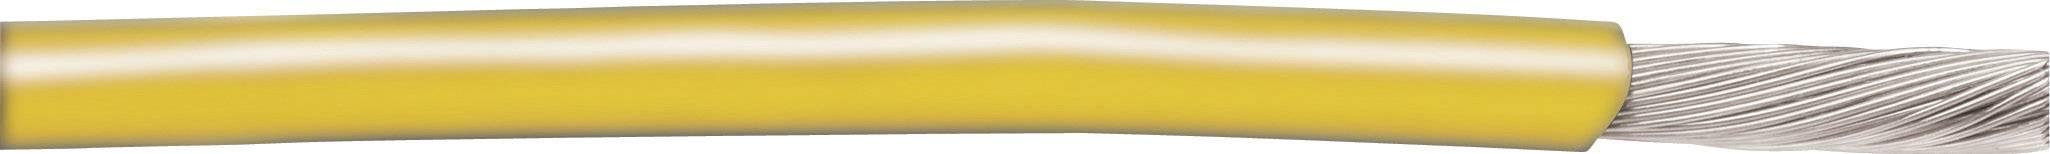 Pletenica 1 x 0.32 mm, bela AlphaWire 6823 30.5 m